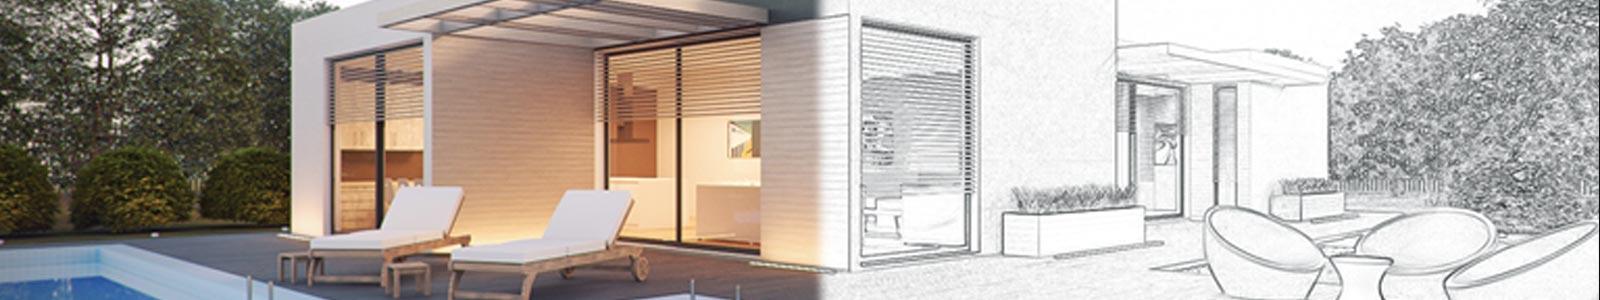 Simulations architecturales